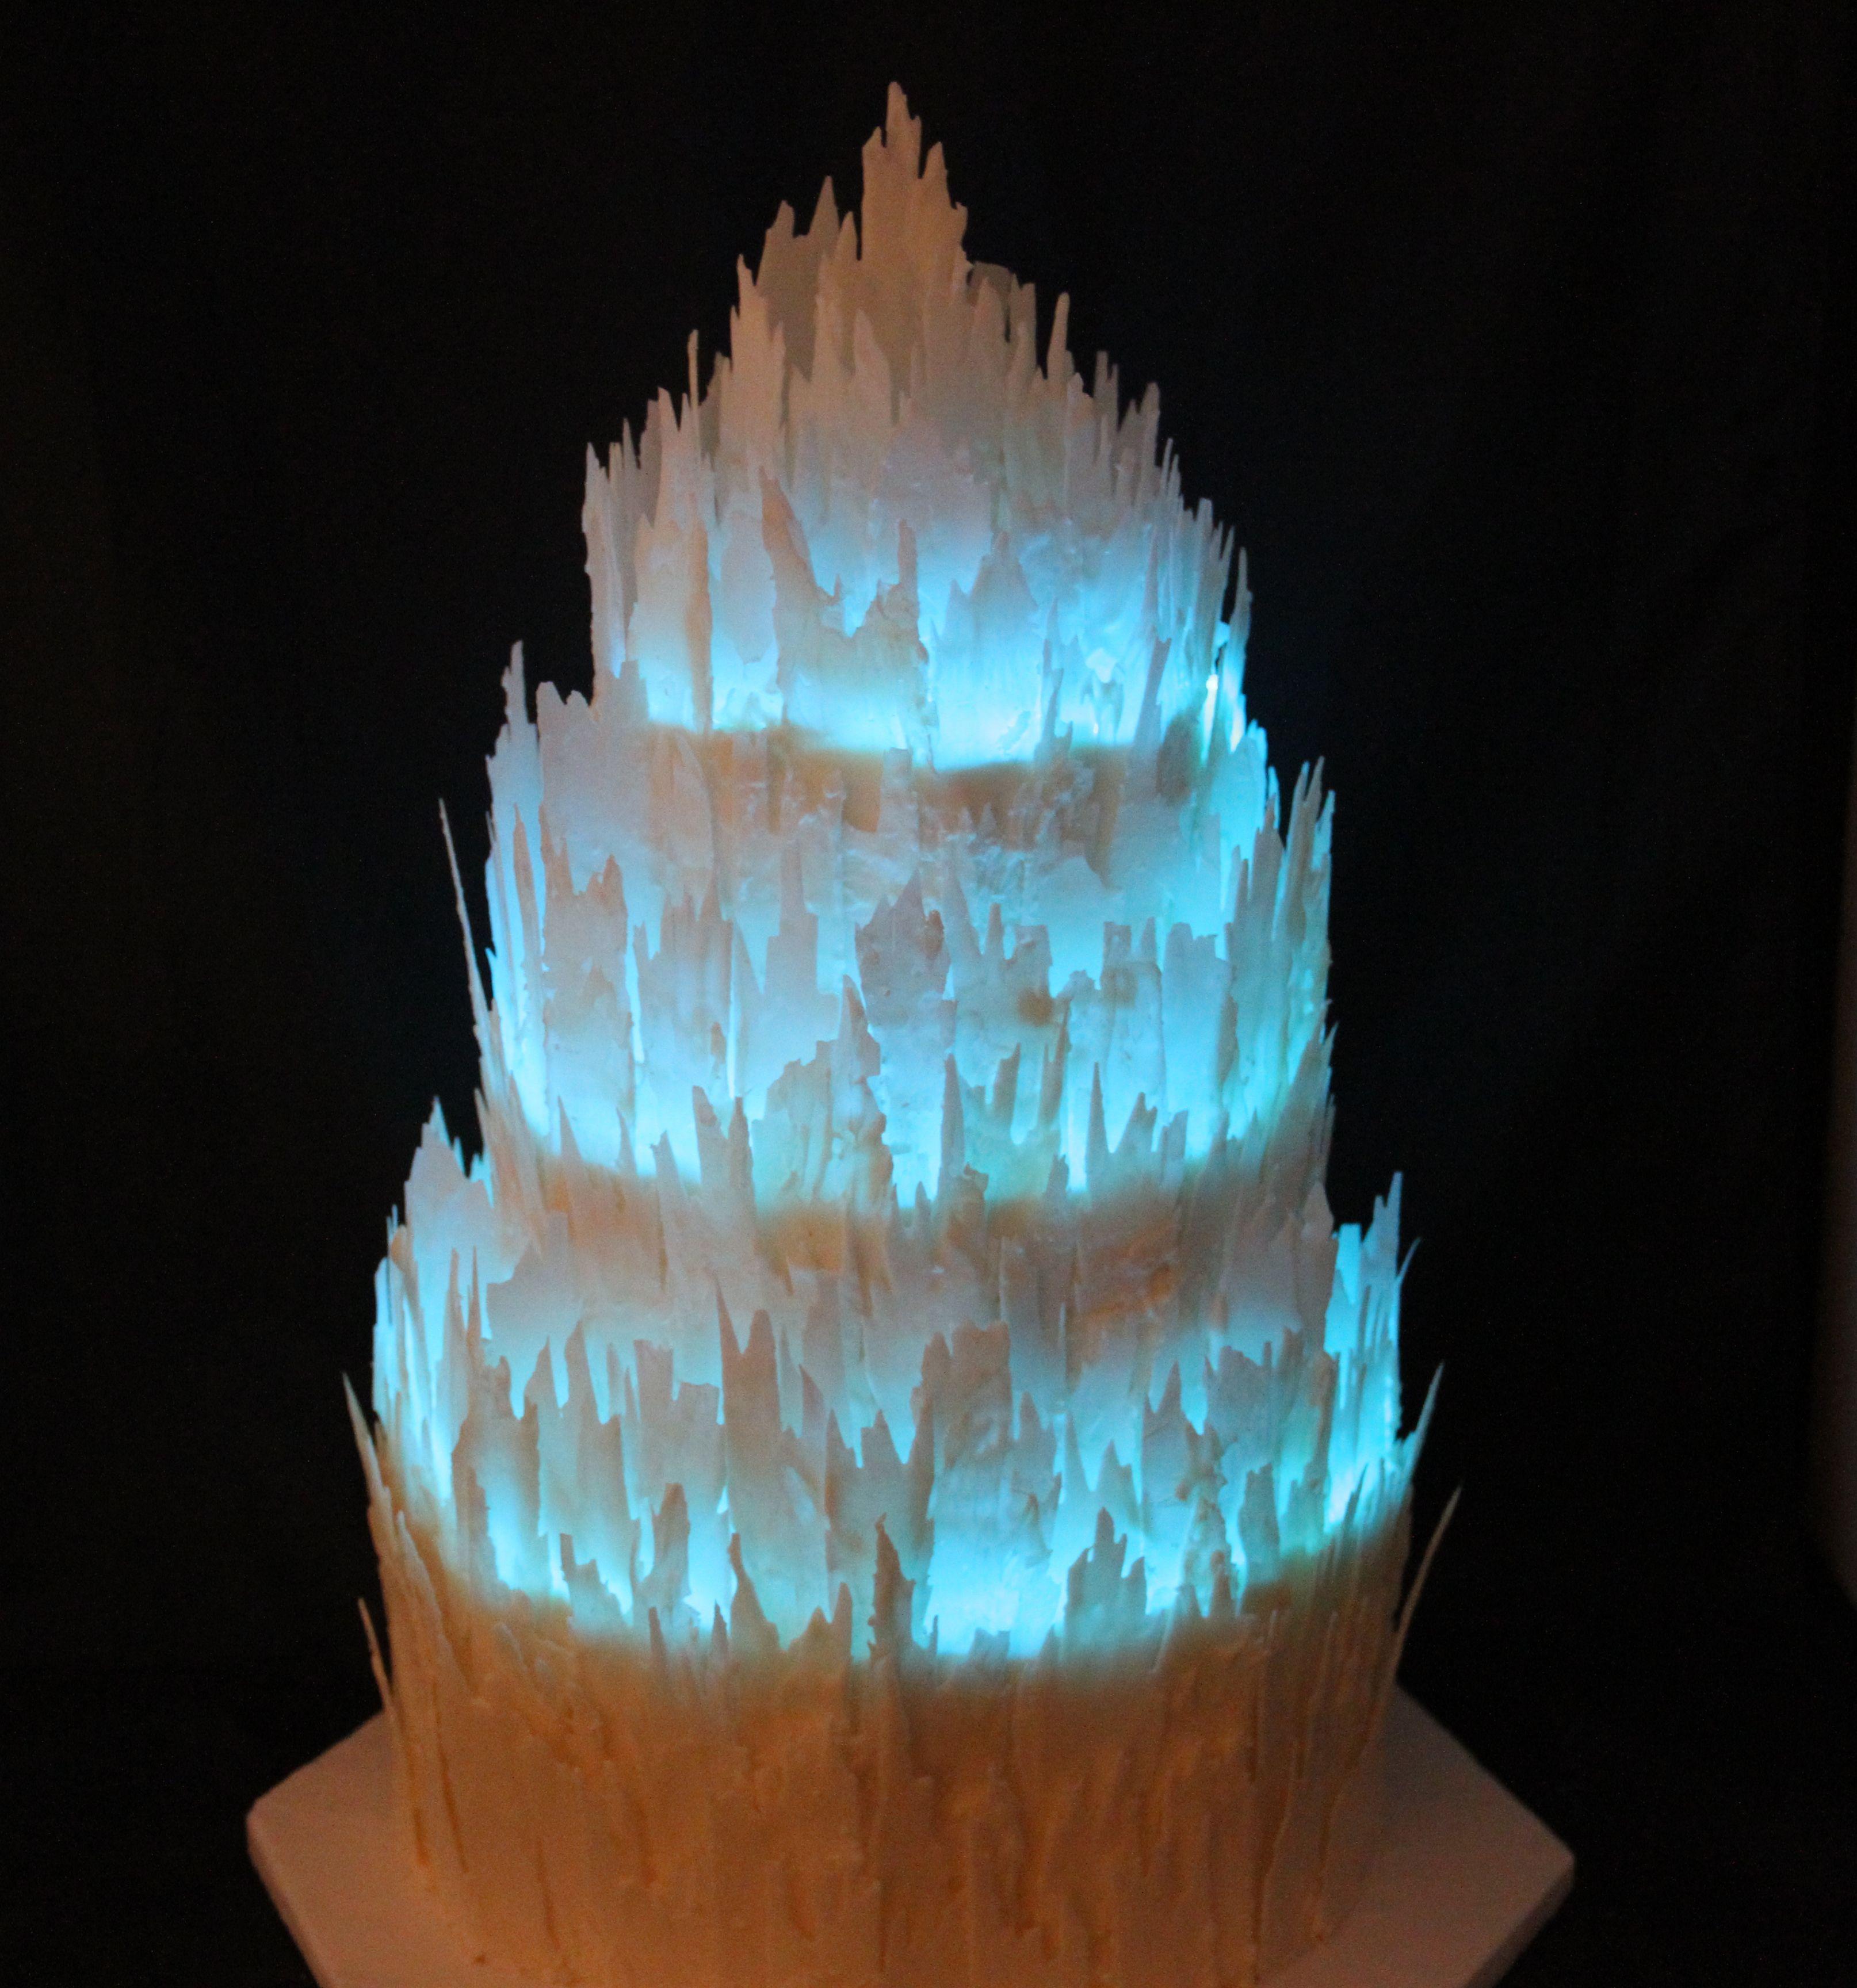 White choc shards with LED light string http